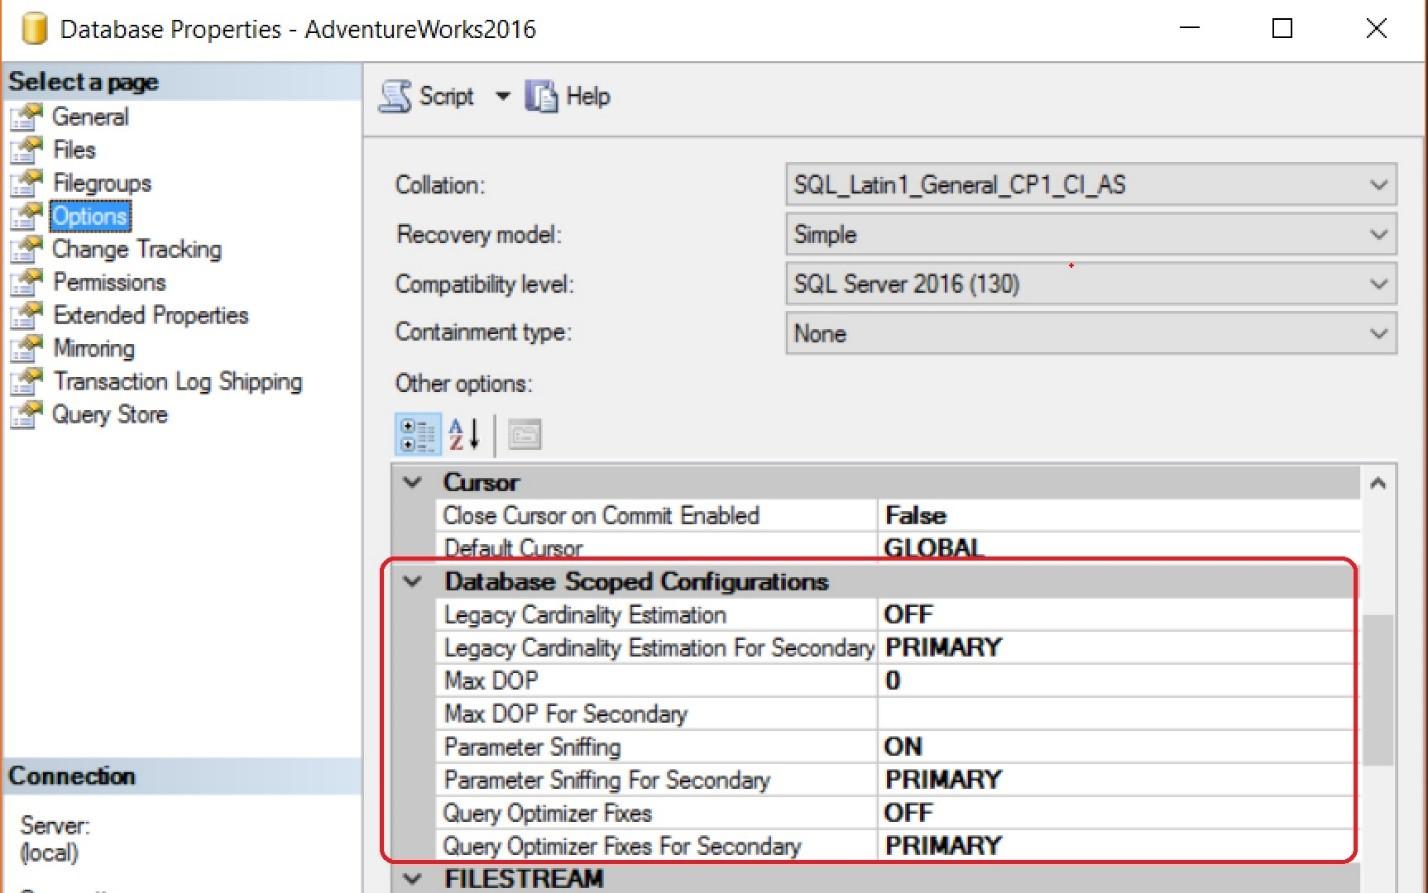 Database Properties Image 1